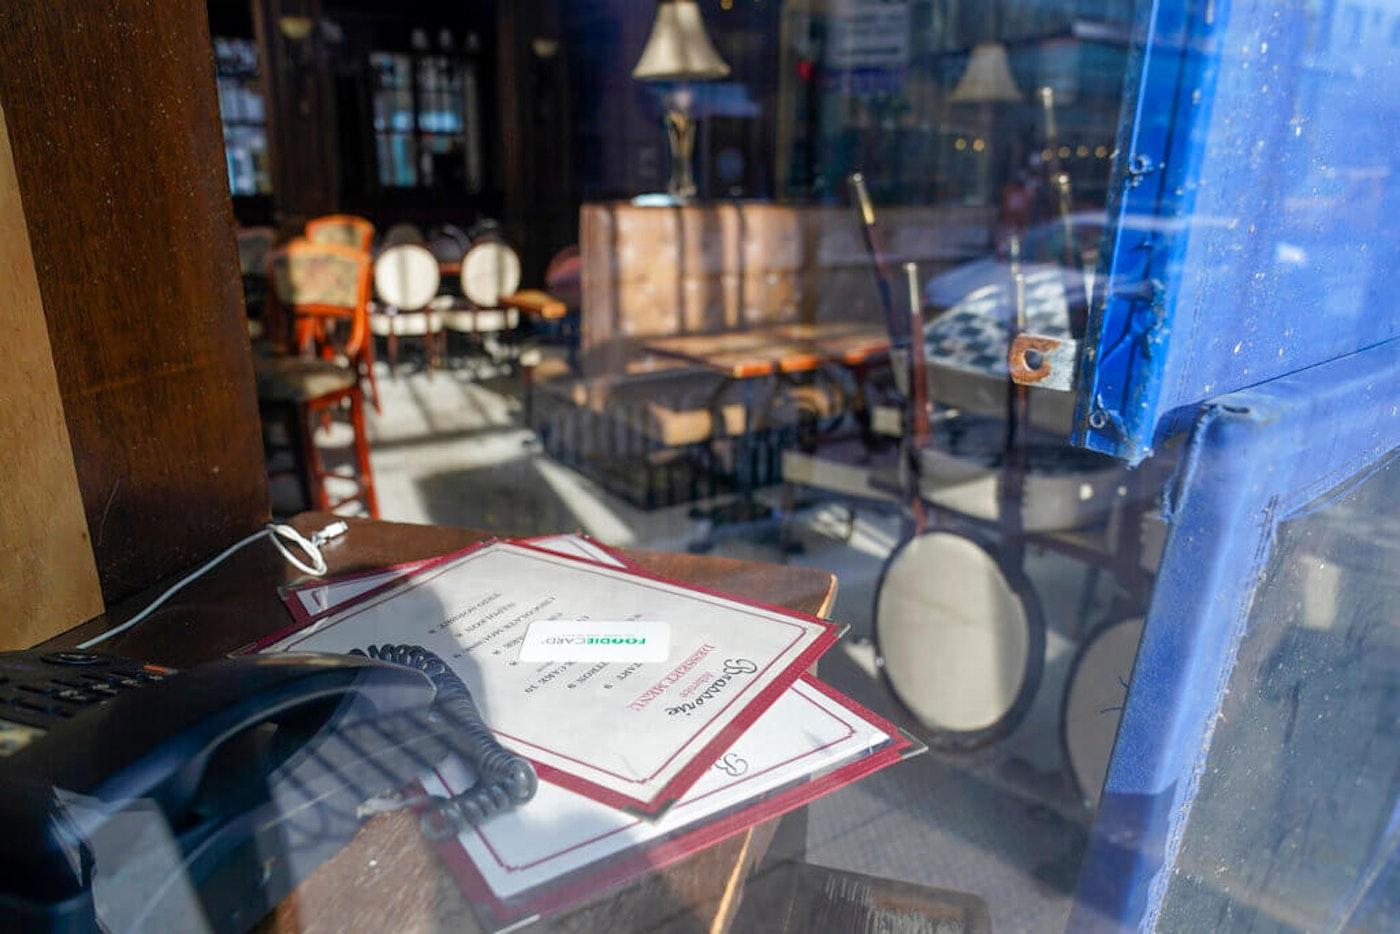 menus at a restaurant closed due to COVID shutdowns